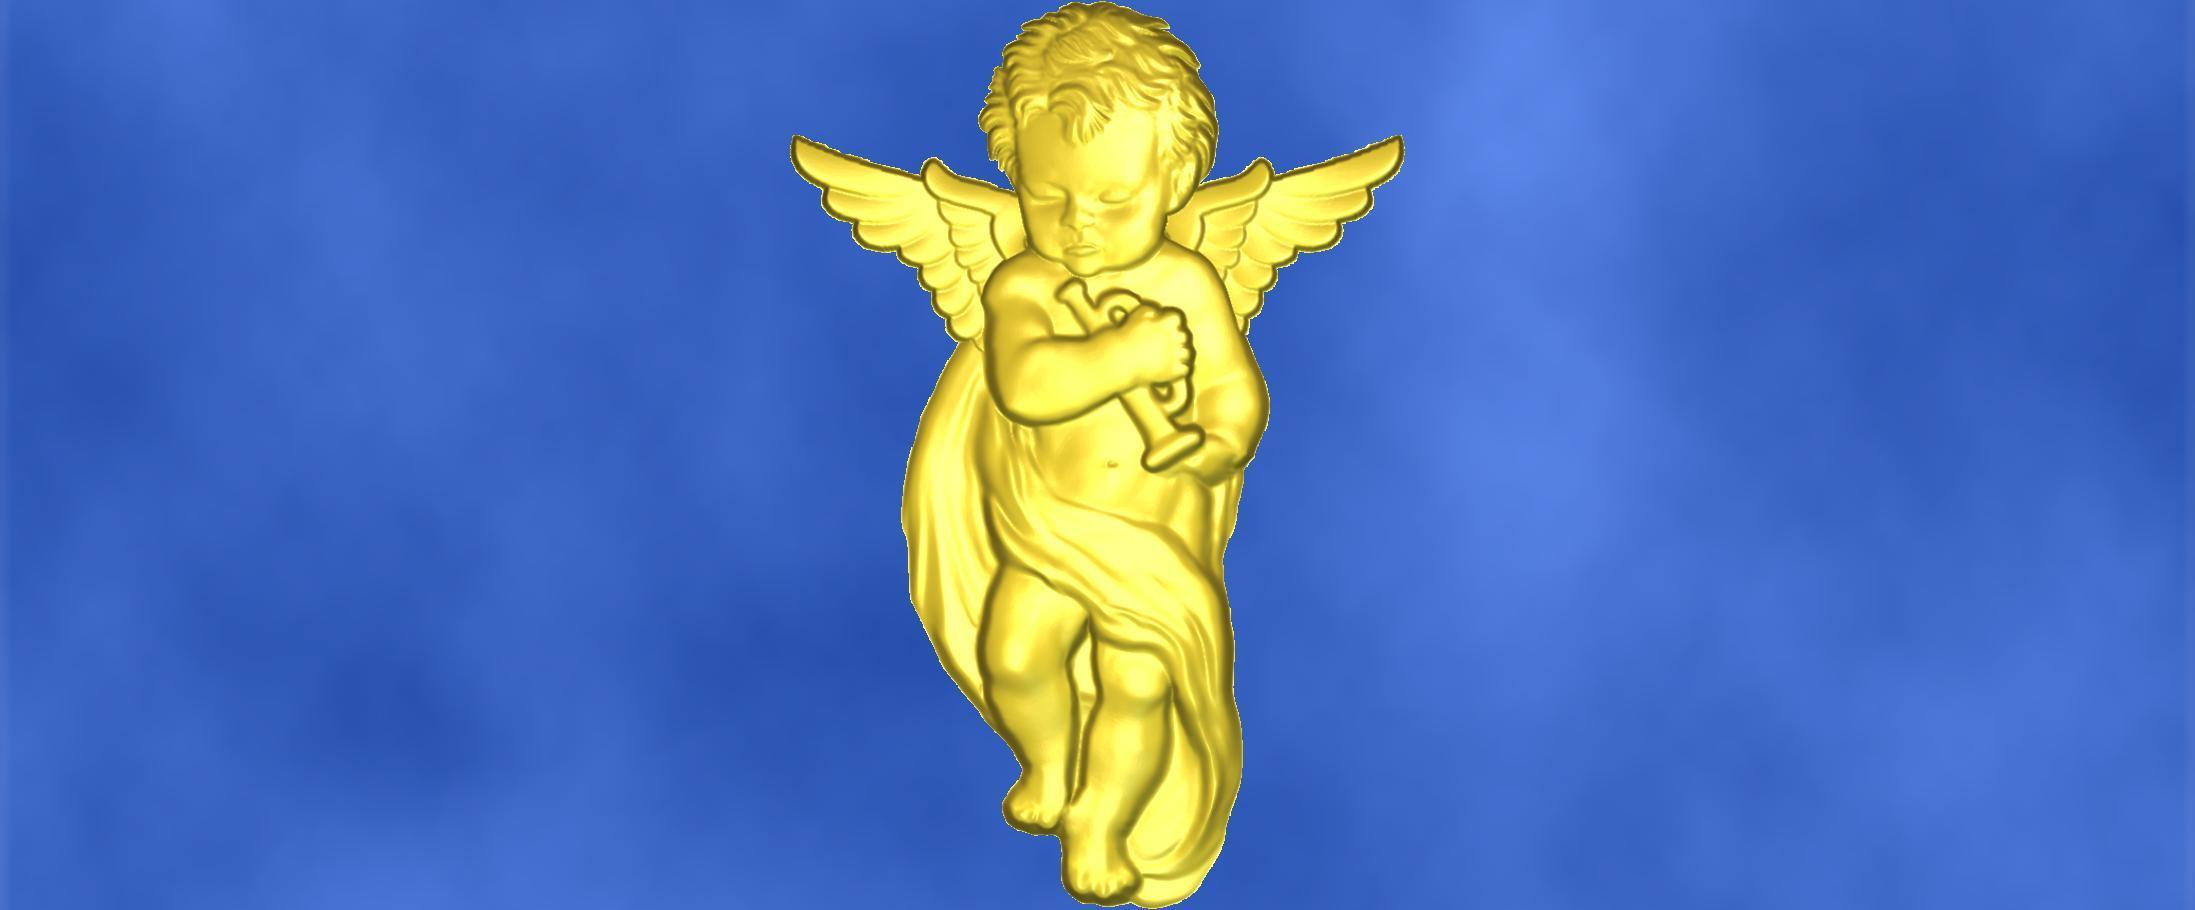 9.jpg Download free STL file 3D STL MODEL CHERUB  • 3D print model, ALPHA_MENA